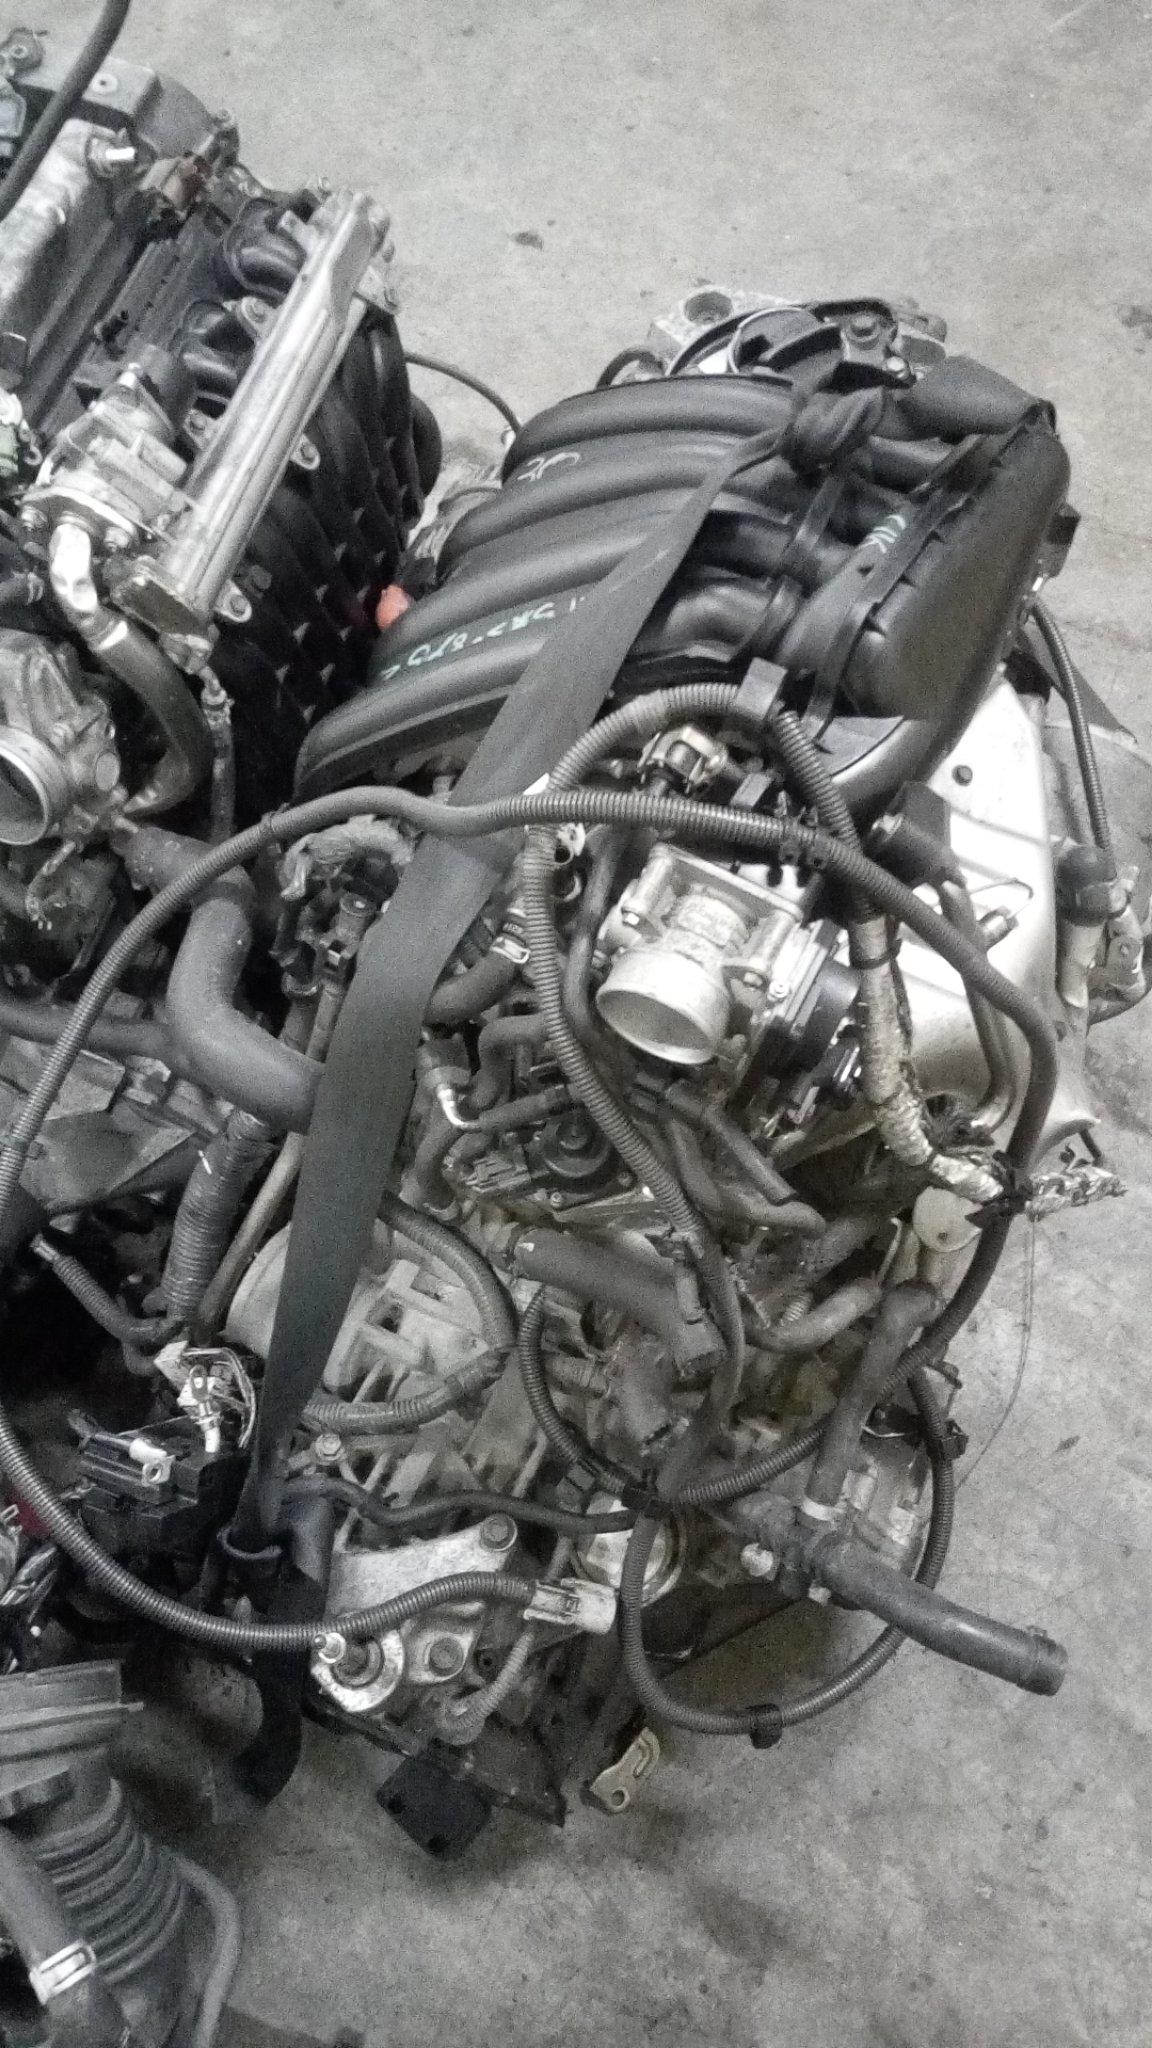 HR15 slim engine